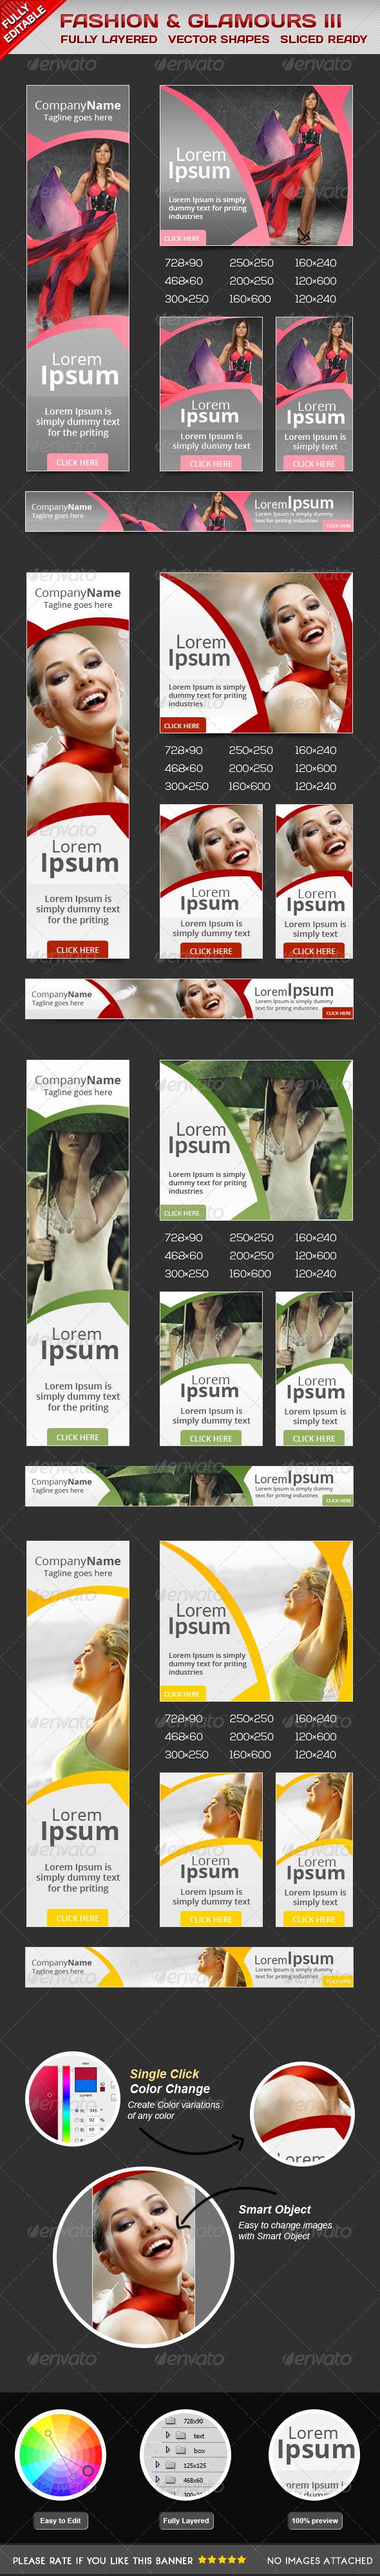 Fashion Glamorous Banners II - Banners & Ads Web Elements